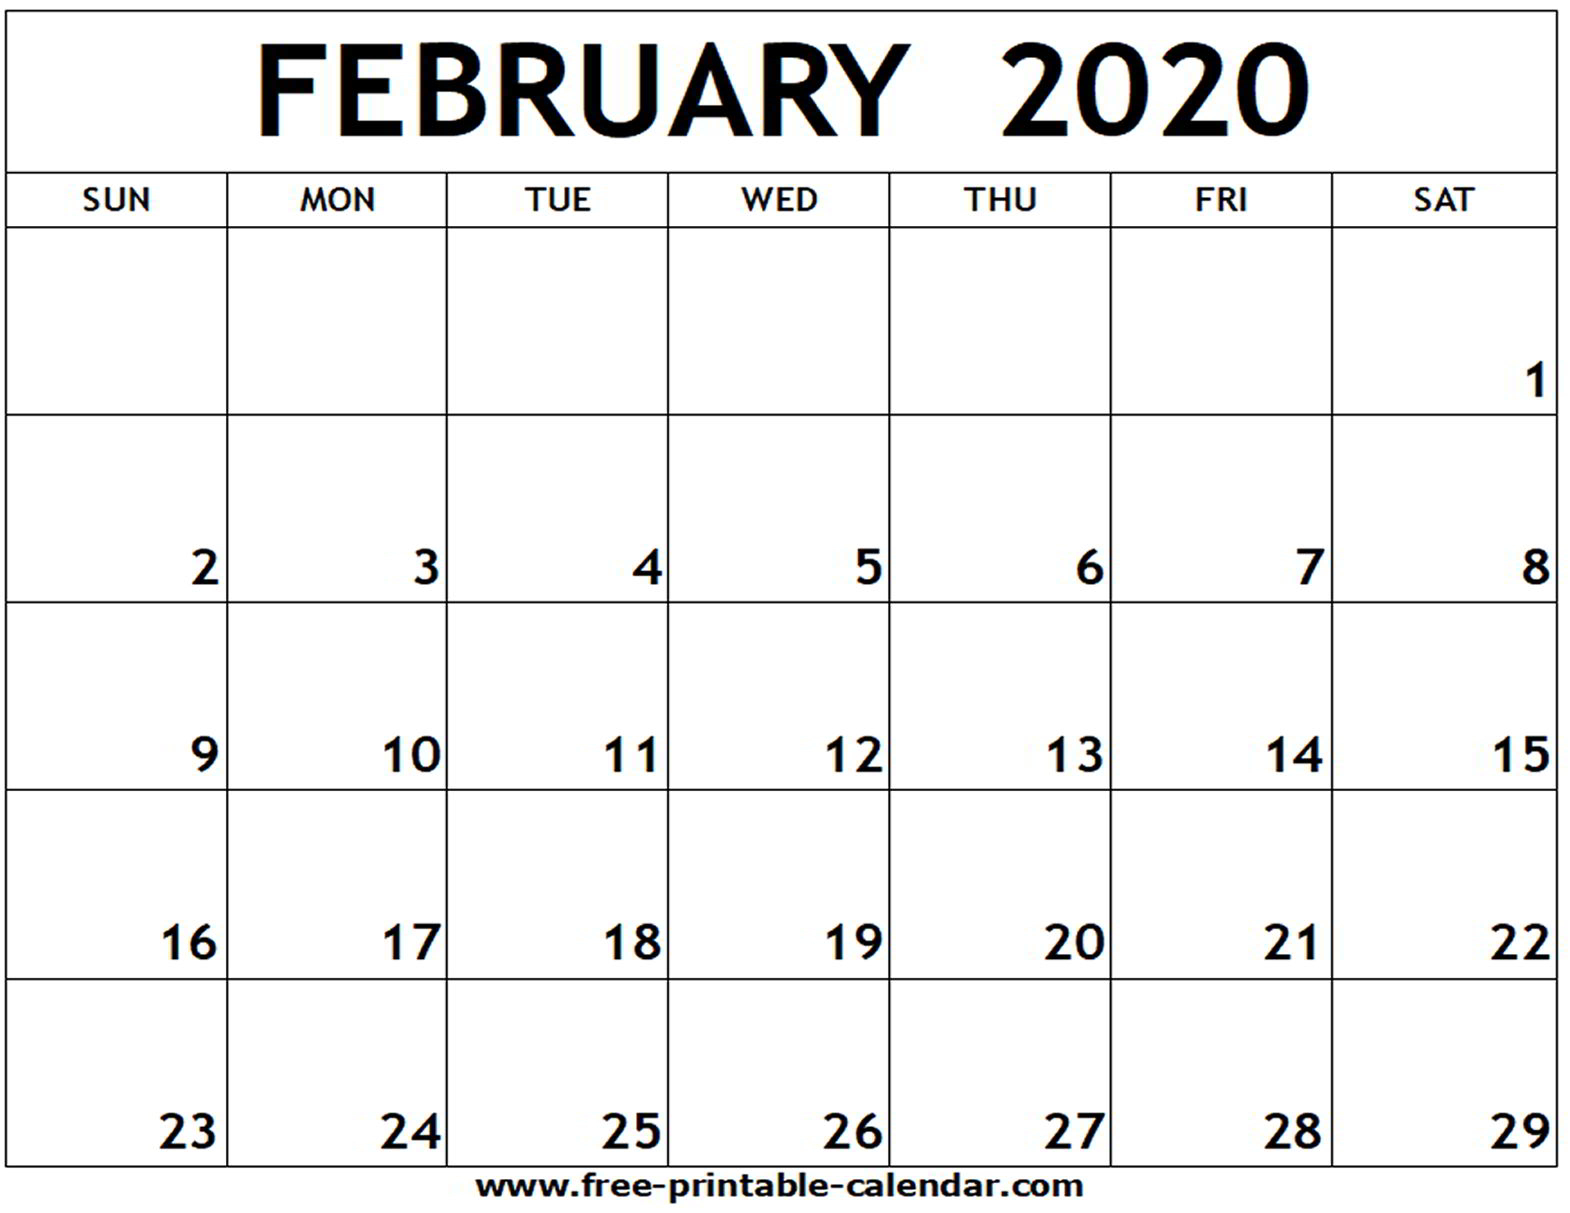 Feb 2020 Calendar Template - Togo.wpart.co